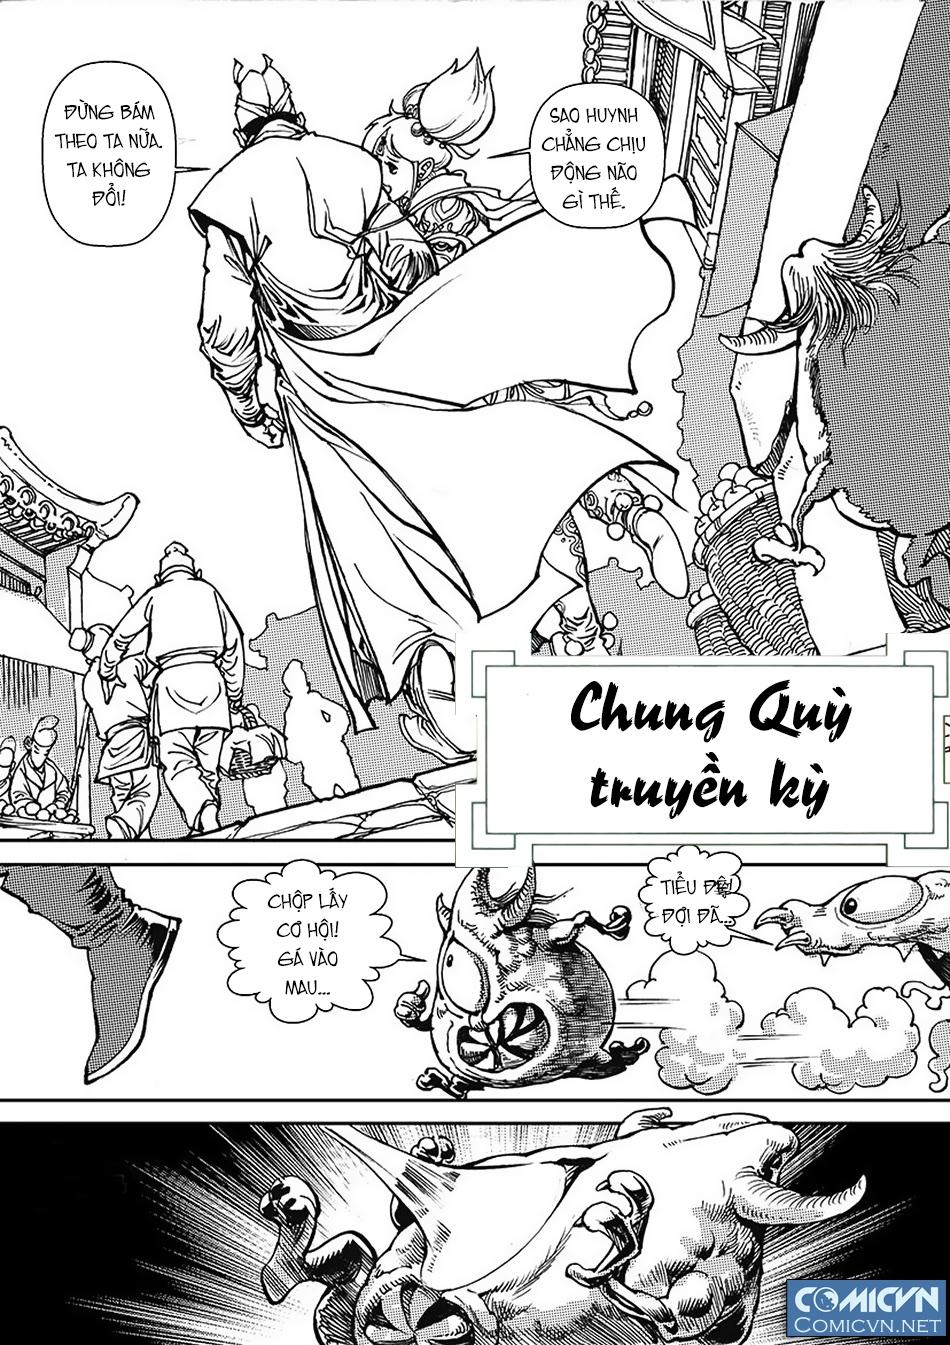 Chung Quỳ Truyền Kỳ Chapter 38 - Hamtruyen.vn